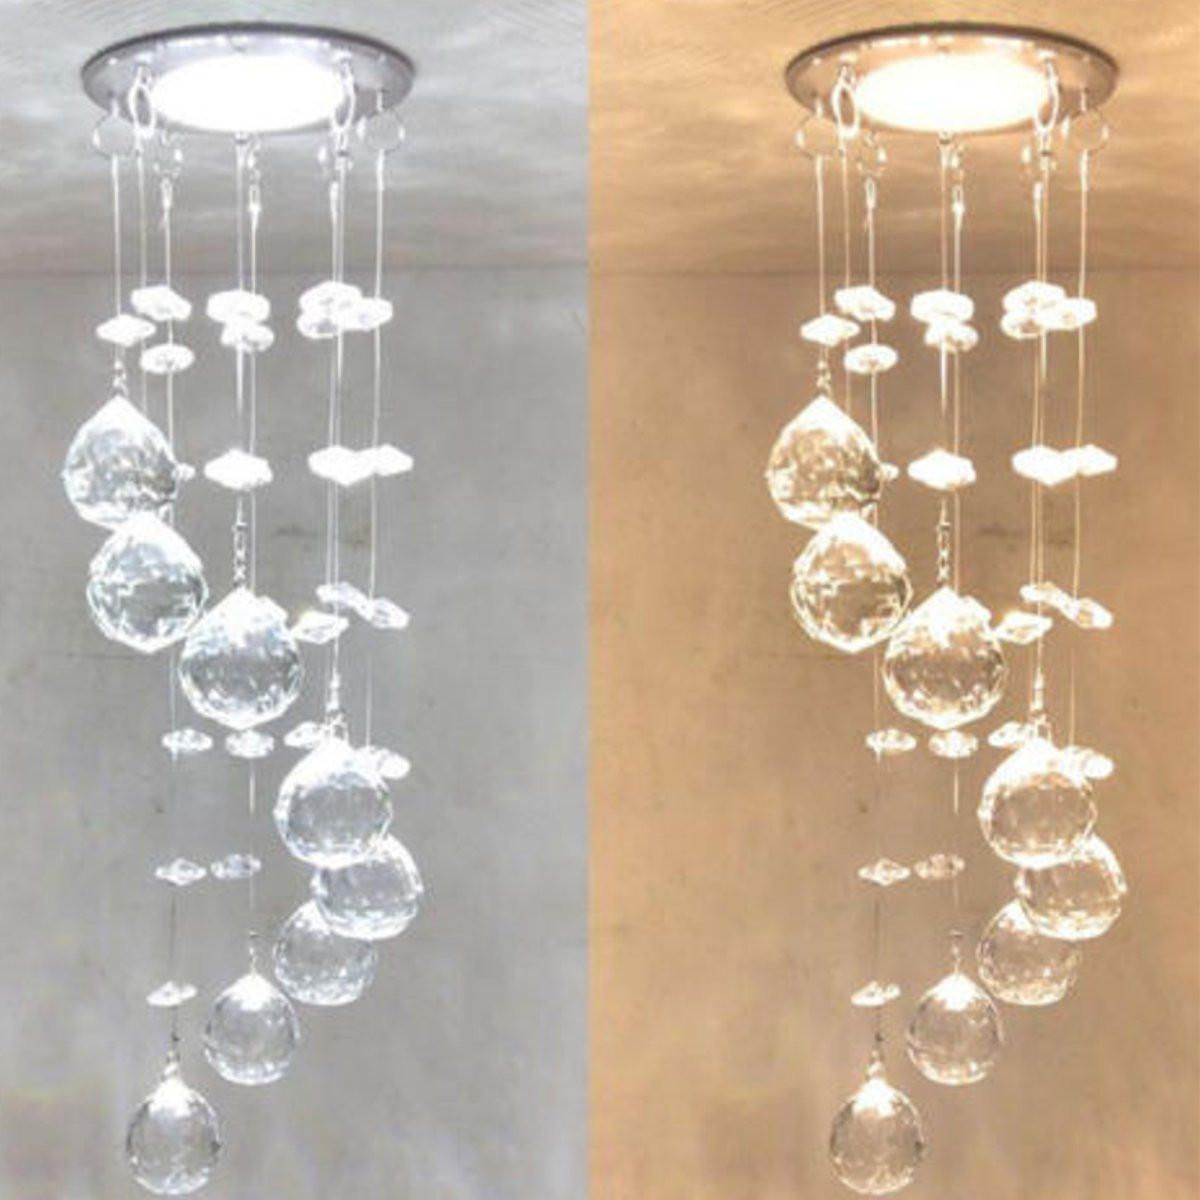 UTU US$17.34 3W LED Crystal Concealed Ceiling Light Small Chandelier Lamp Pendant Hallway